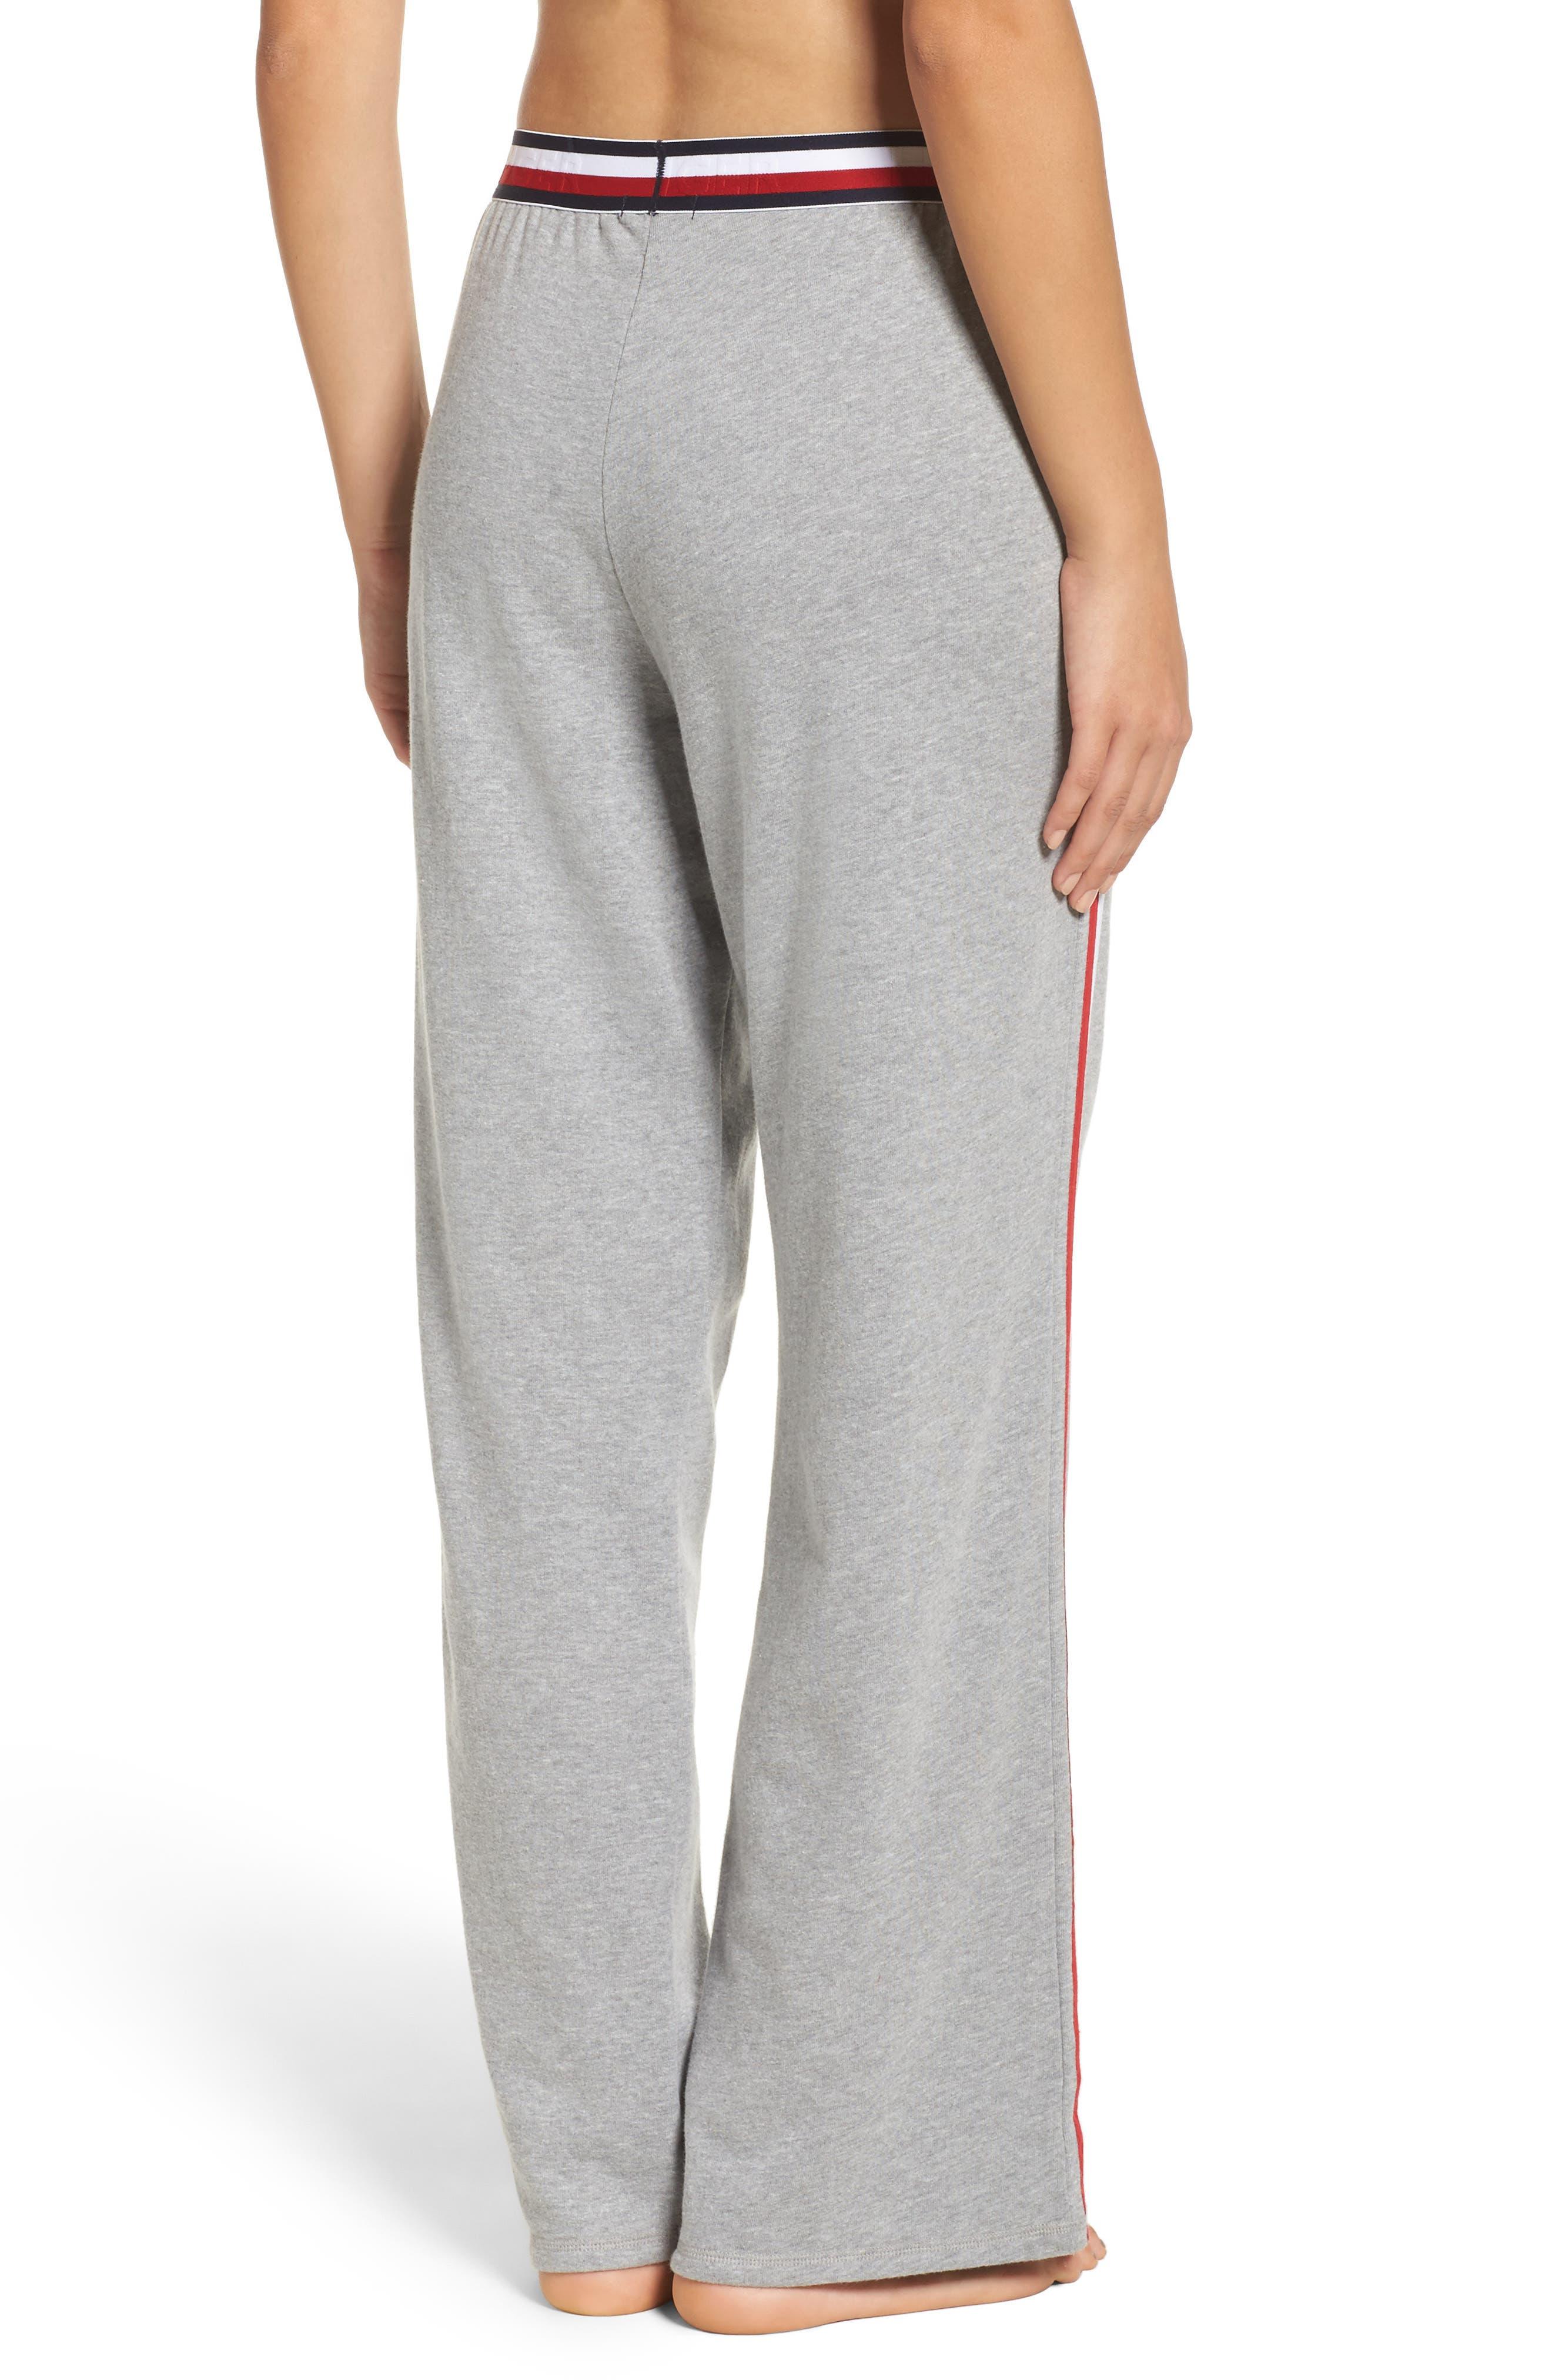 Lounge Pants,                             Alternate thumbnail 2, color,                             Heather Grey